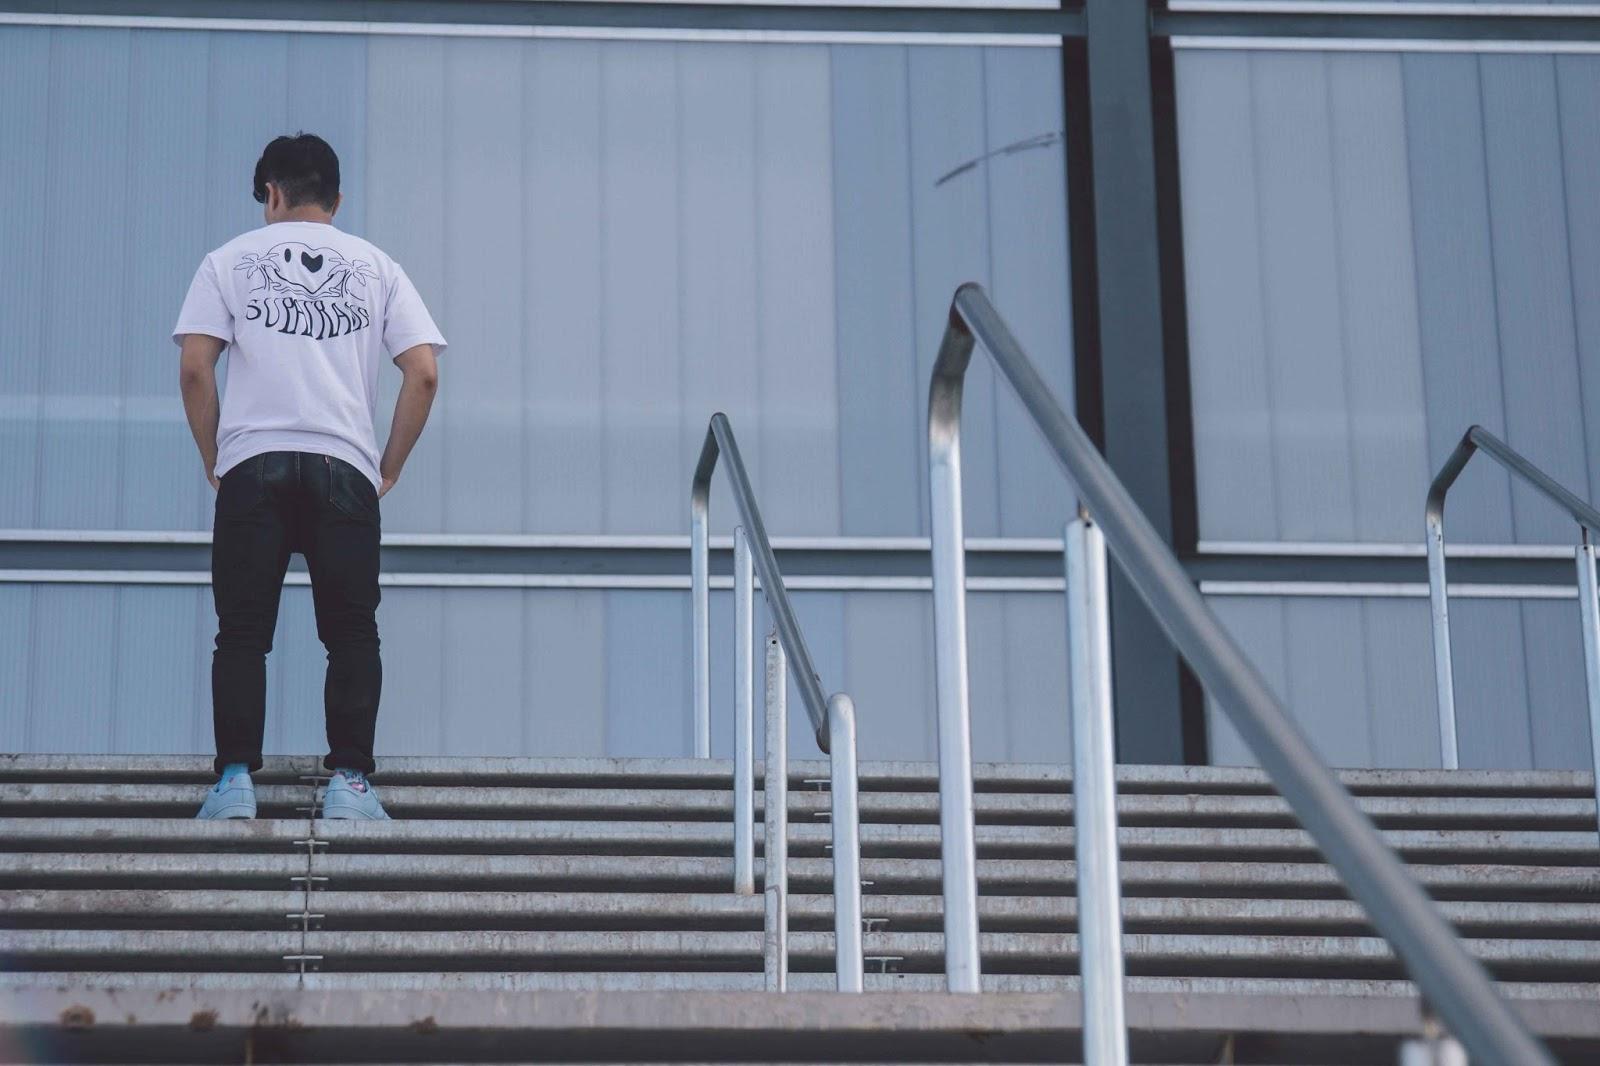 supatramp streetwear brasil 03 - Conheça a marca brasileira Supatramp